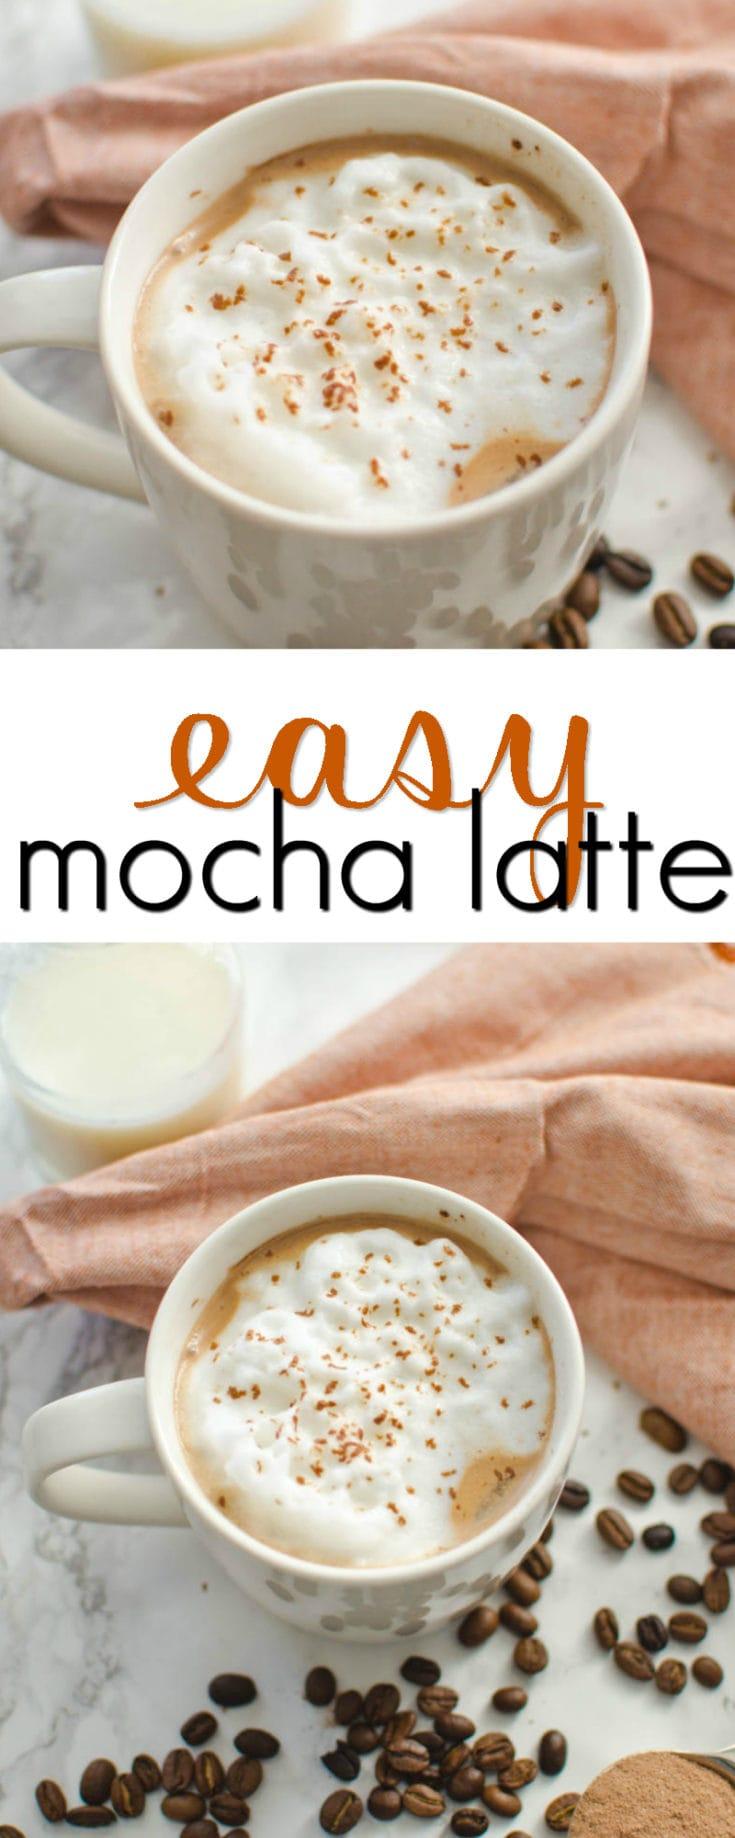 Easy Mocha Latte